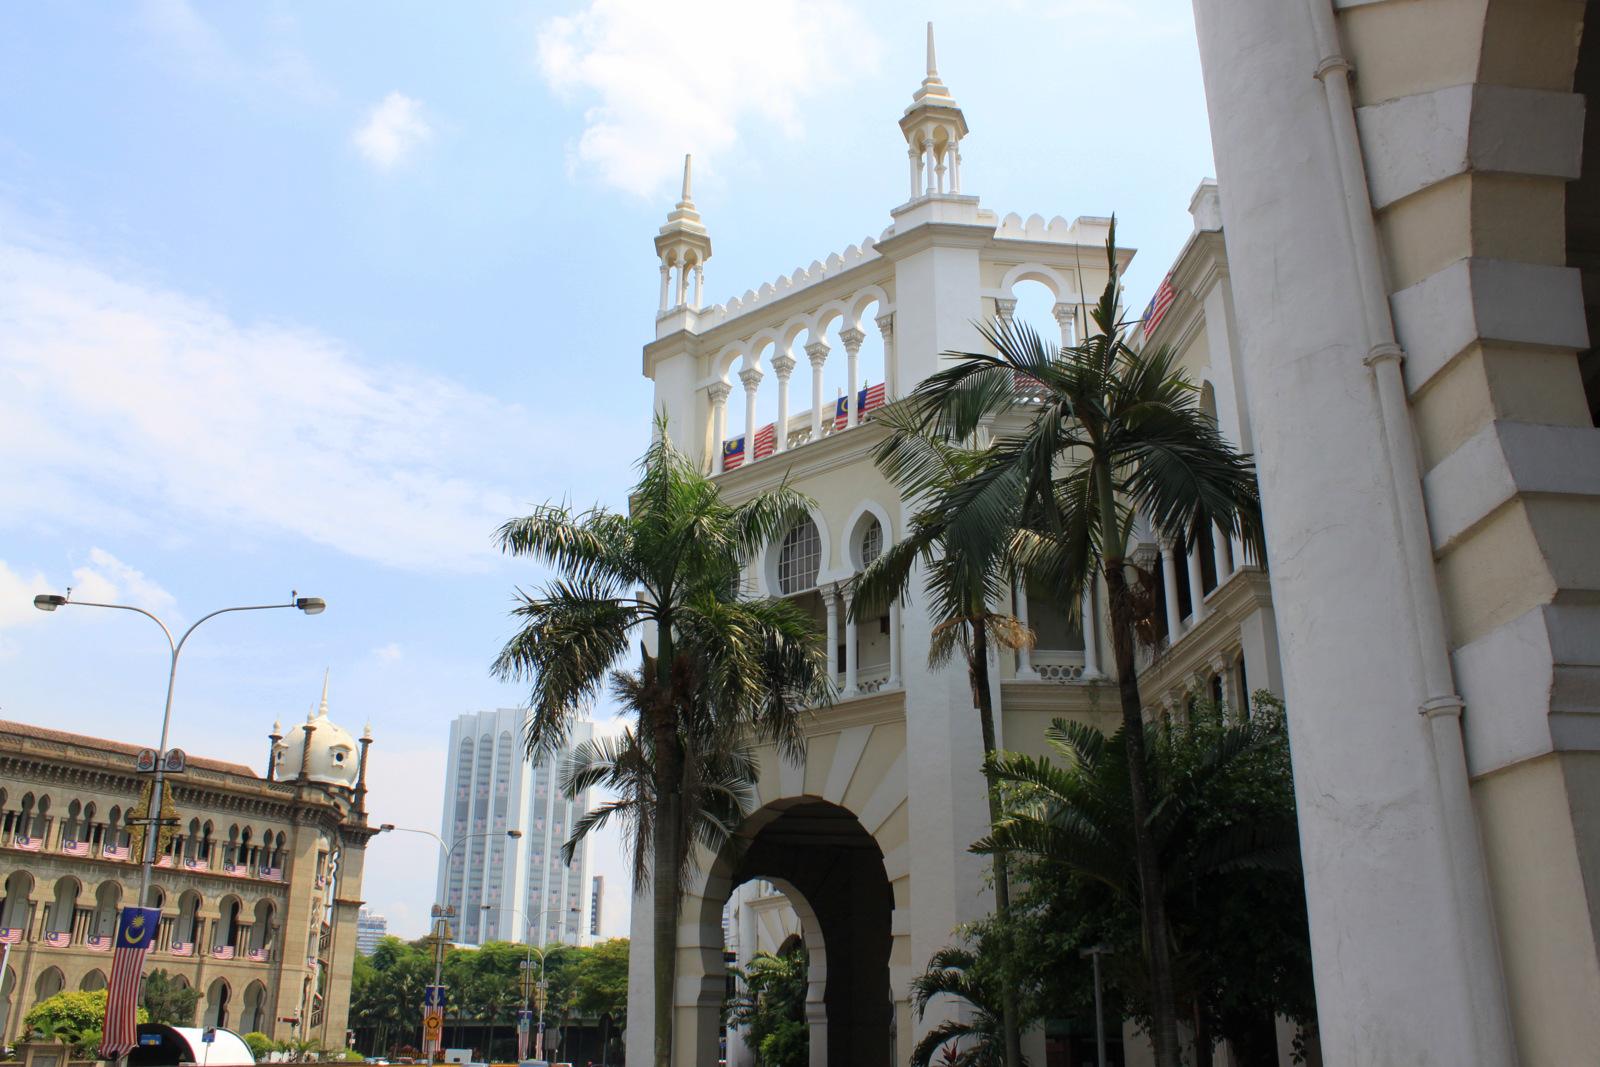 KL Railway Station - Kuala Lumpur